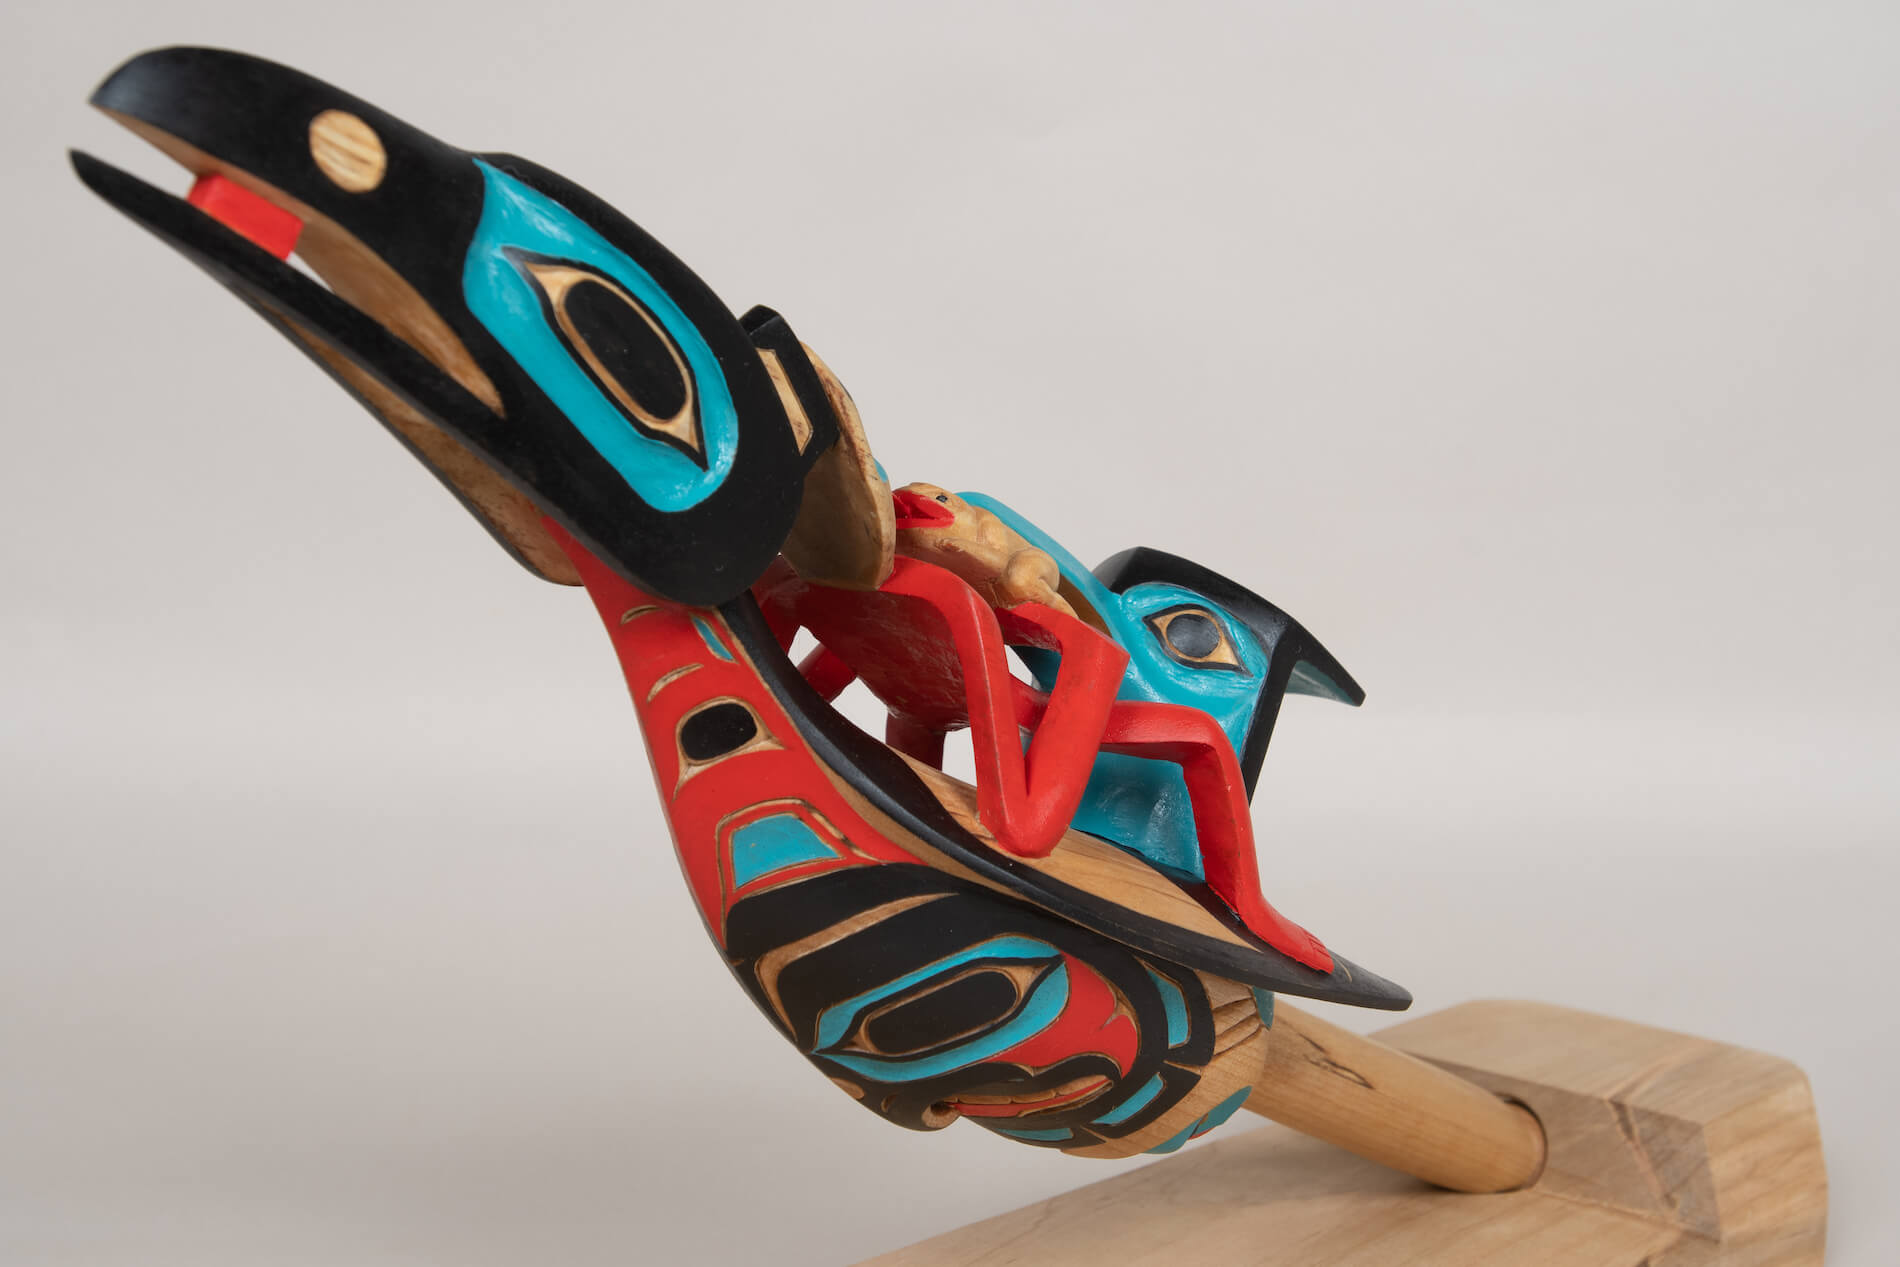 Eugene Alfred - Yukon Artist - Chiefs Raven Rattle - YPAC-1623